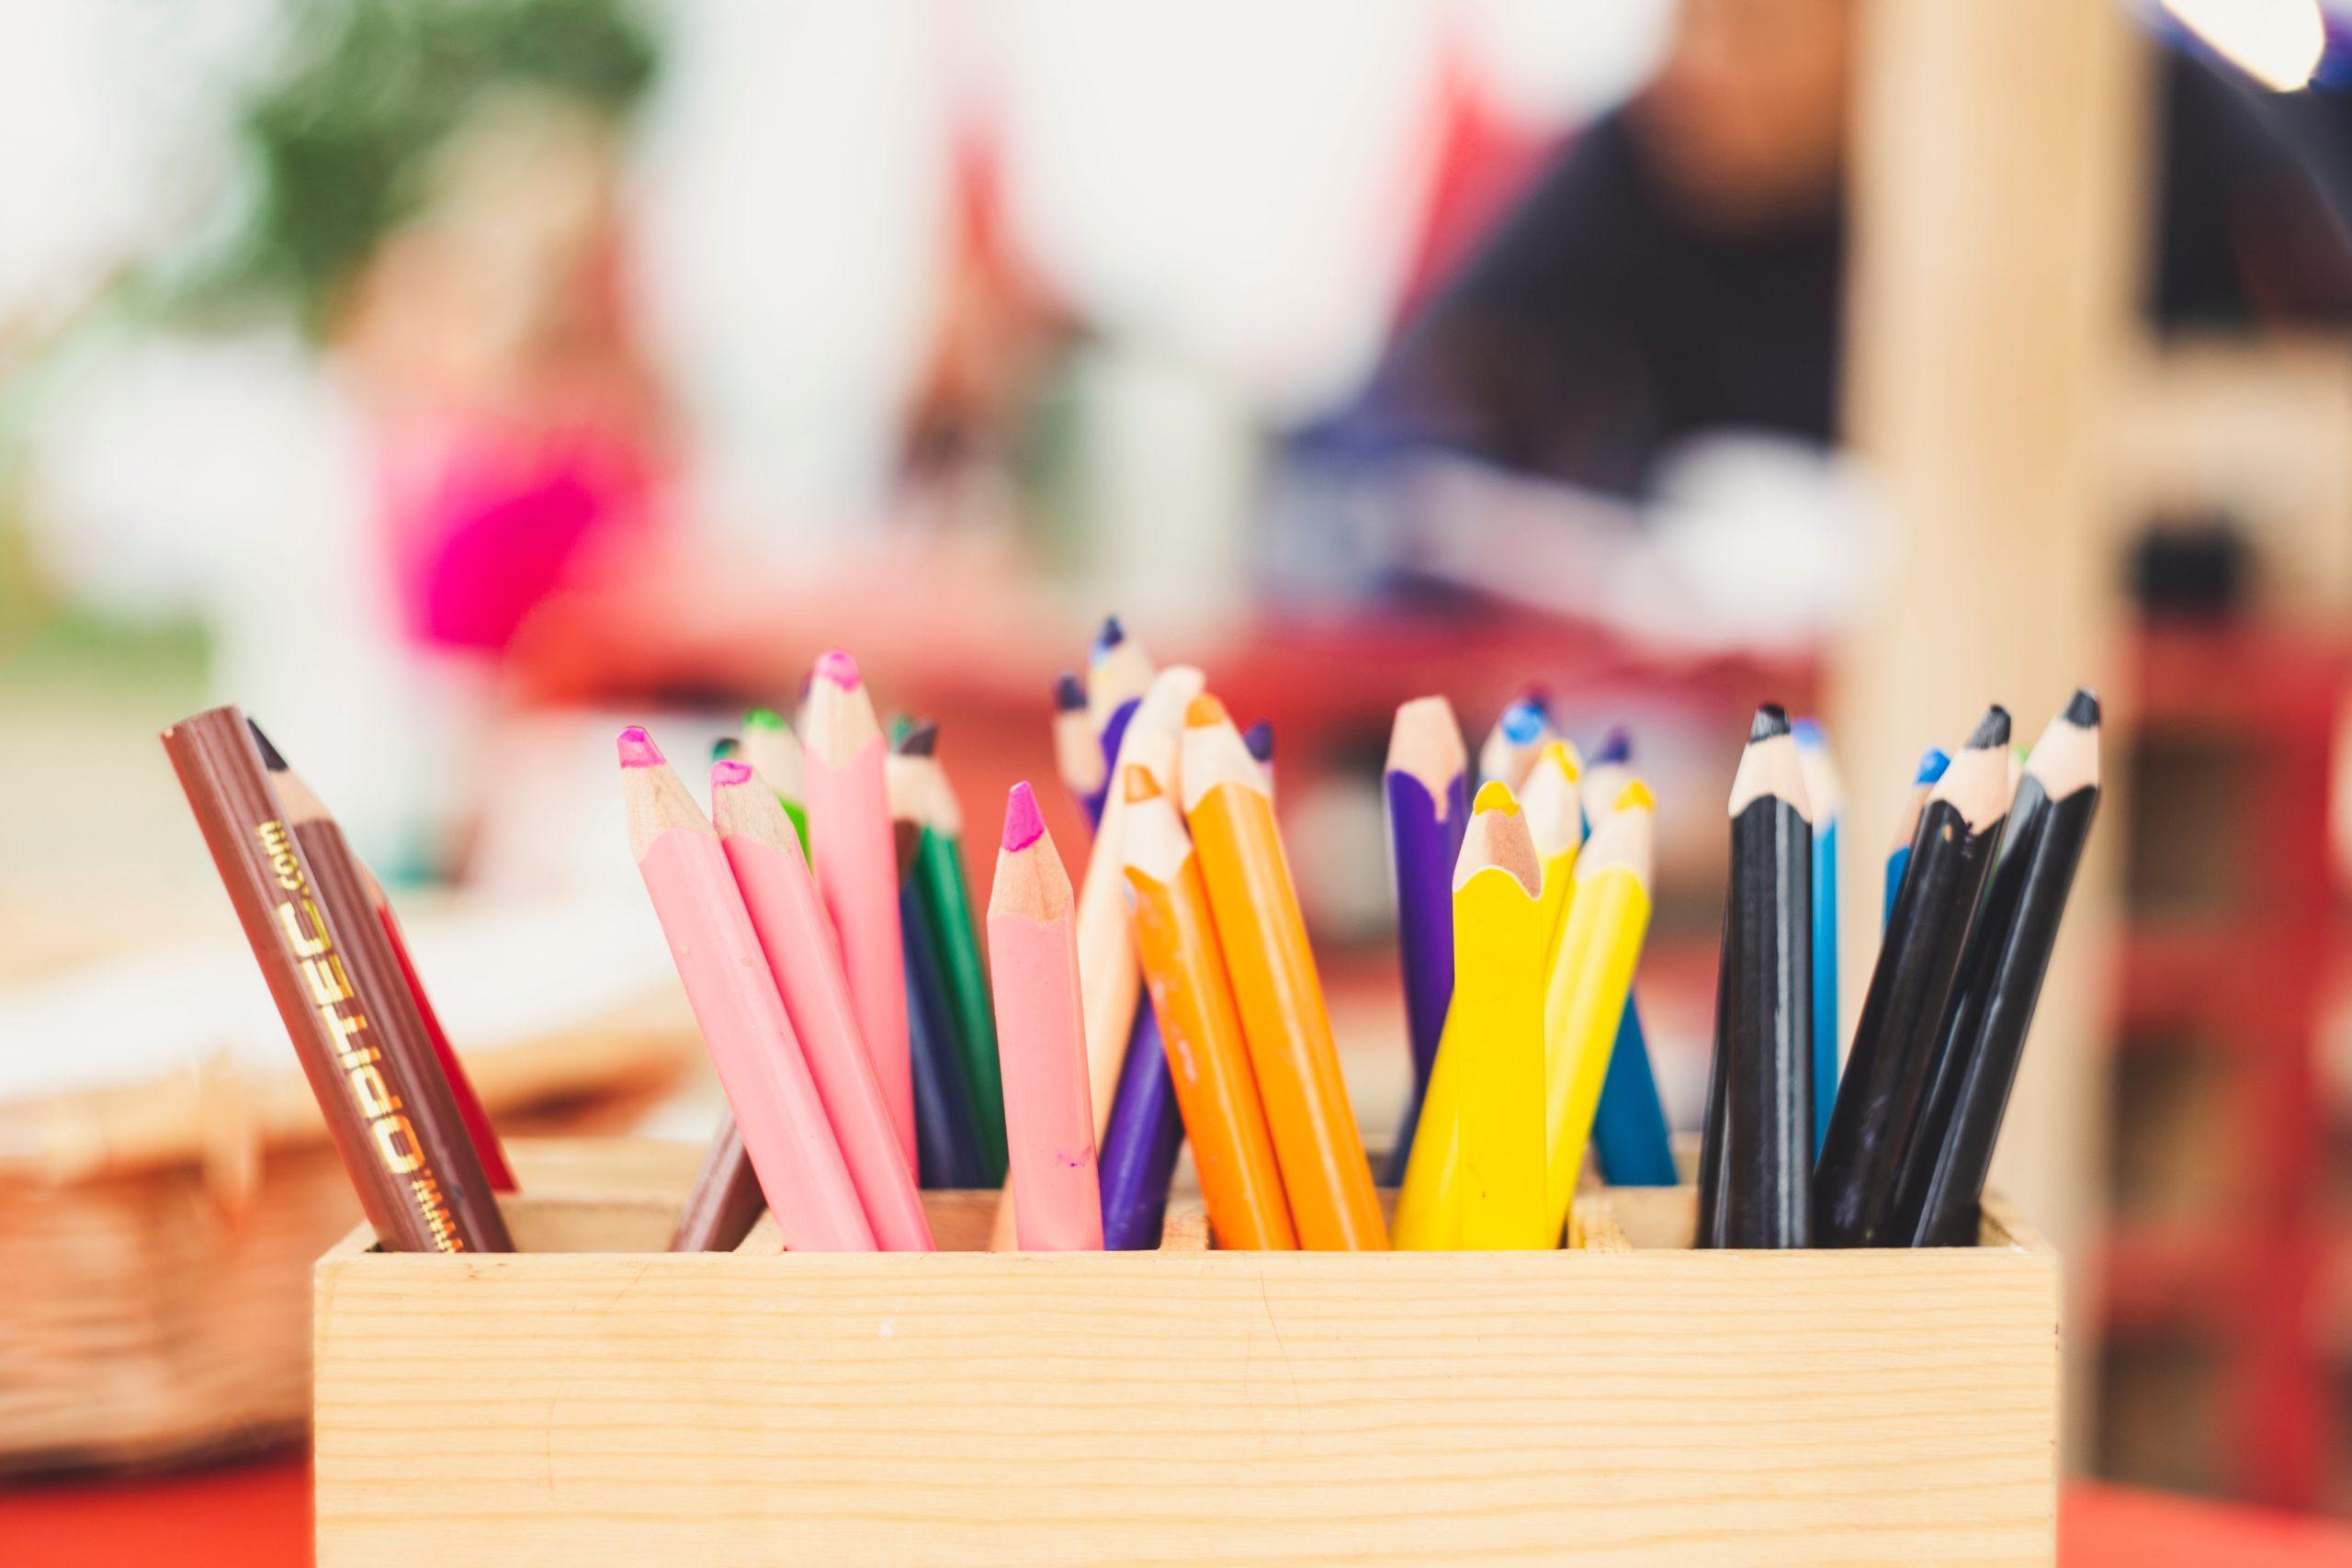 保育所の優先入所・放課後児童健全育成事業等の配慮